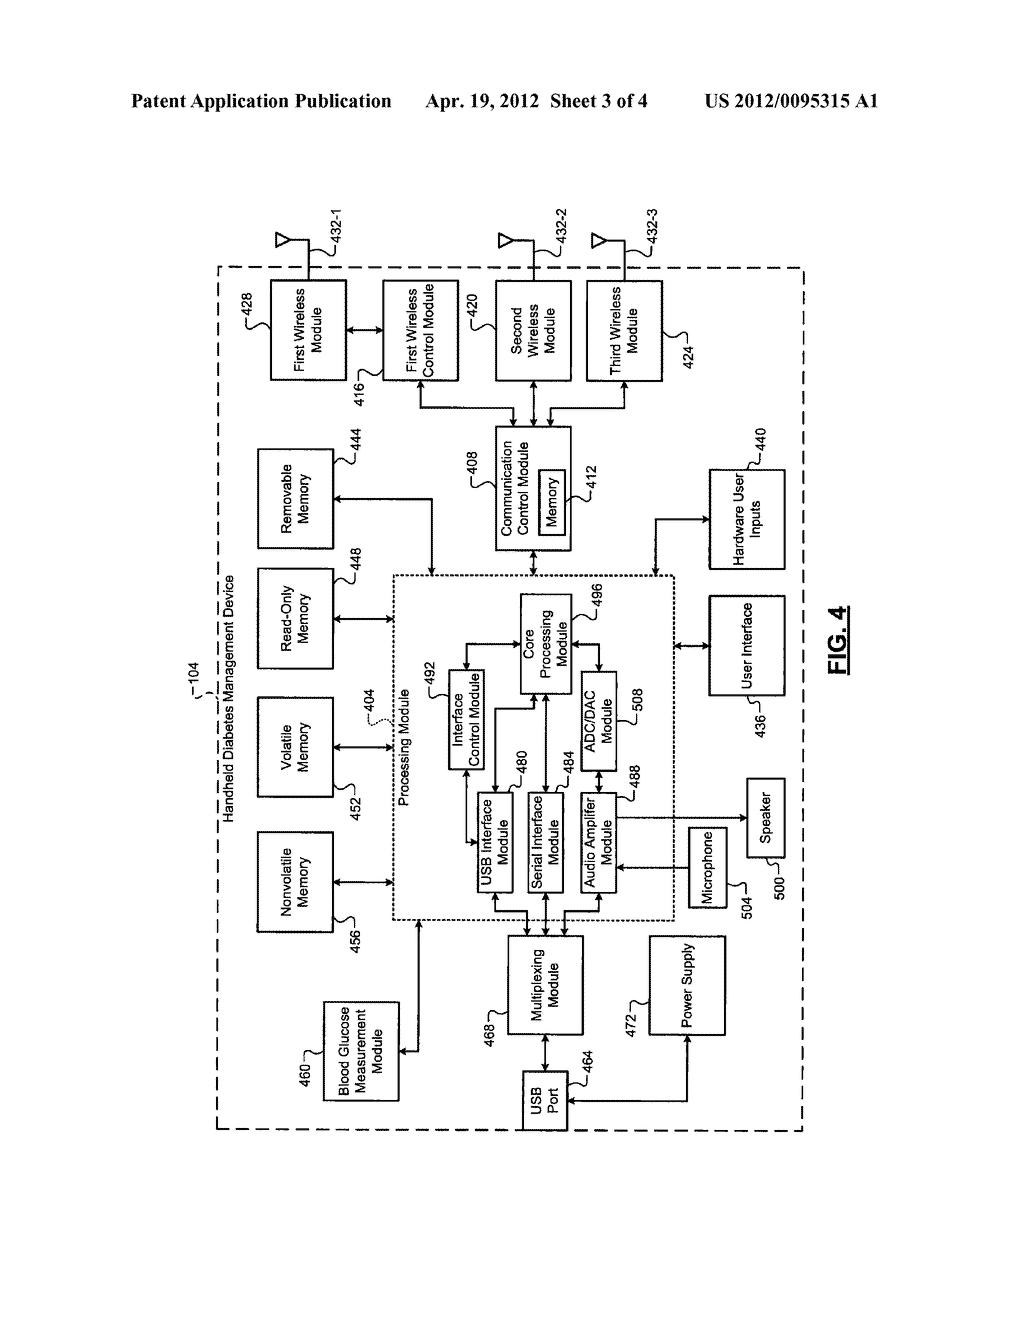 Diagram Of Blood Glucose Meter Wiring Diagrams Eaton Br Type 15 20 Amp Singlepole Bd Tandem Circuit Breakerbd1520 Configuration Interfaces Schematic Rh Patentsencyclopedia Com